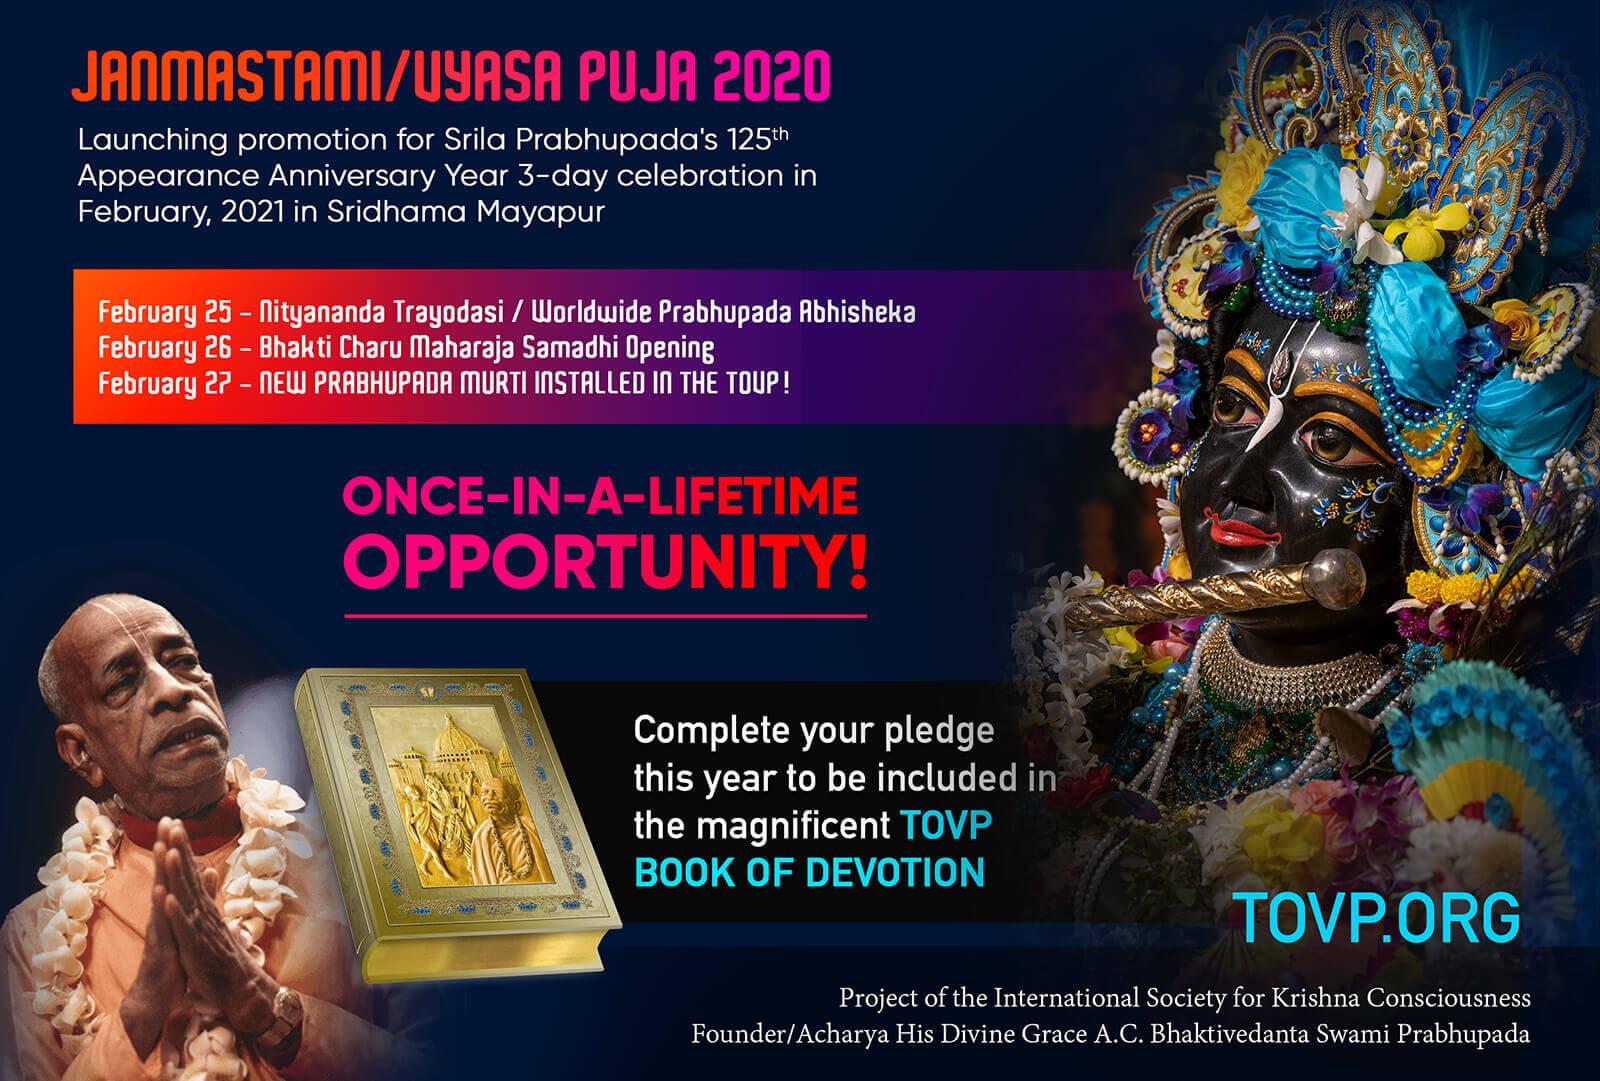 Janmastami / Vyasa Puja 2020